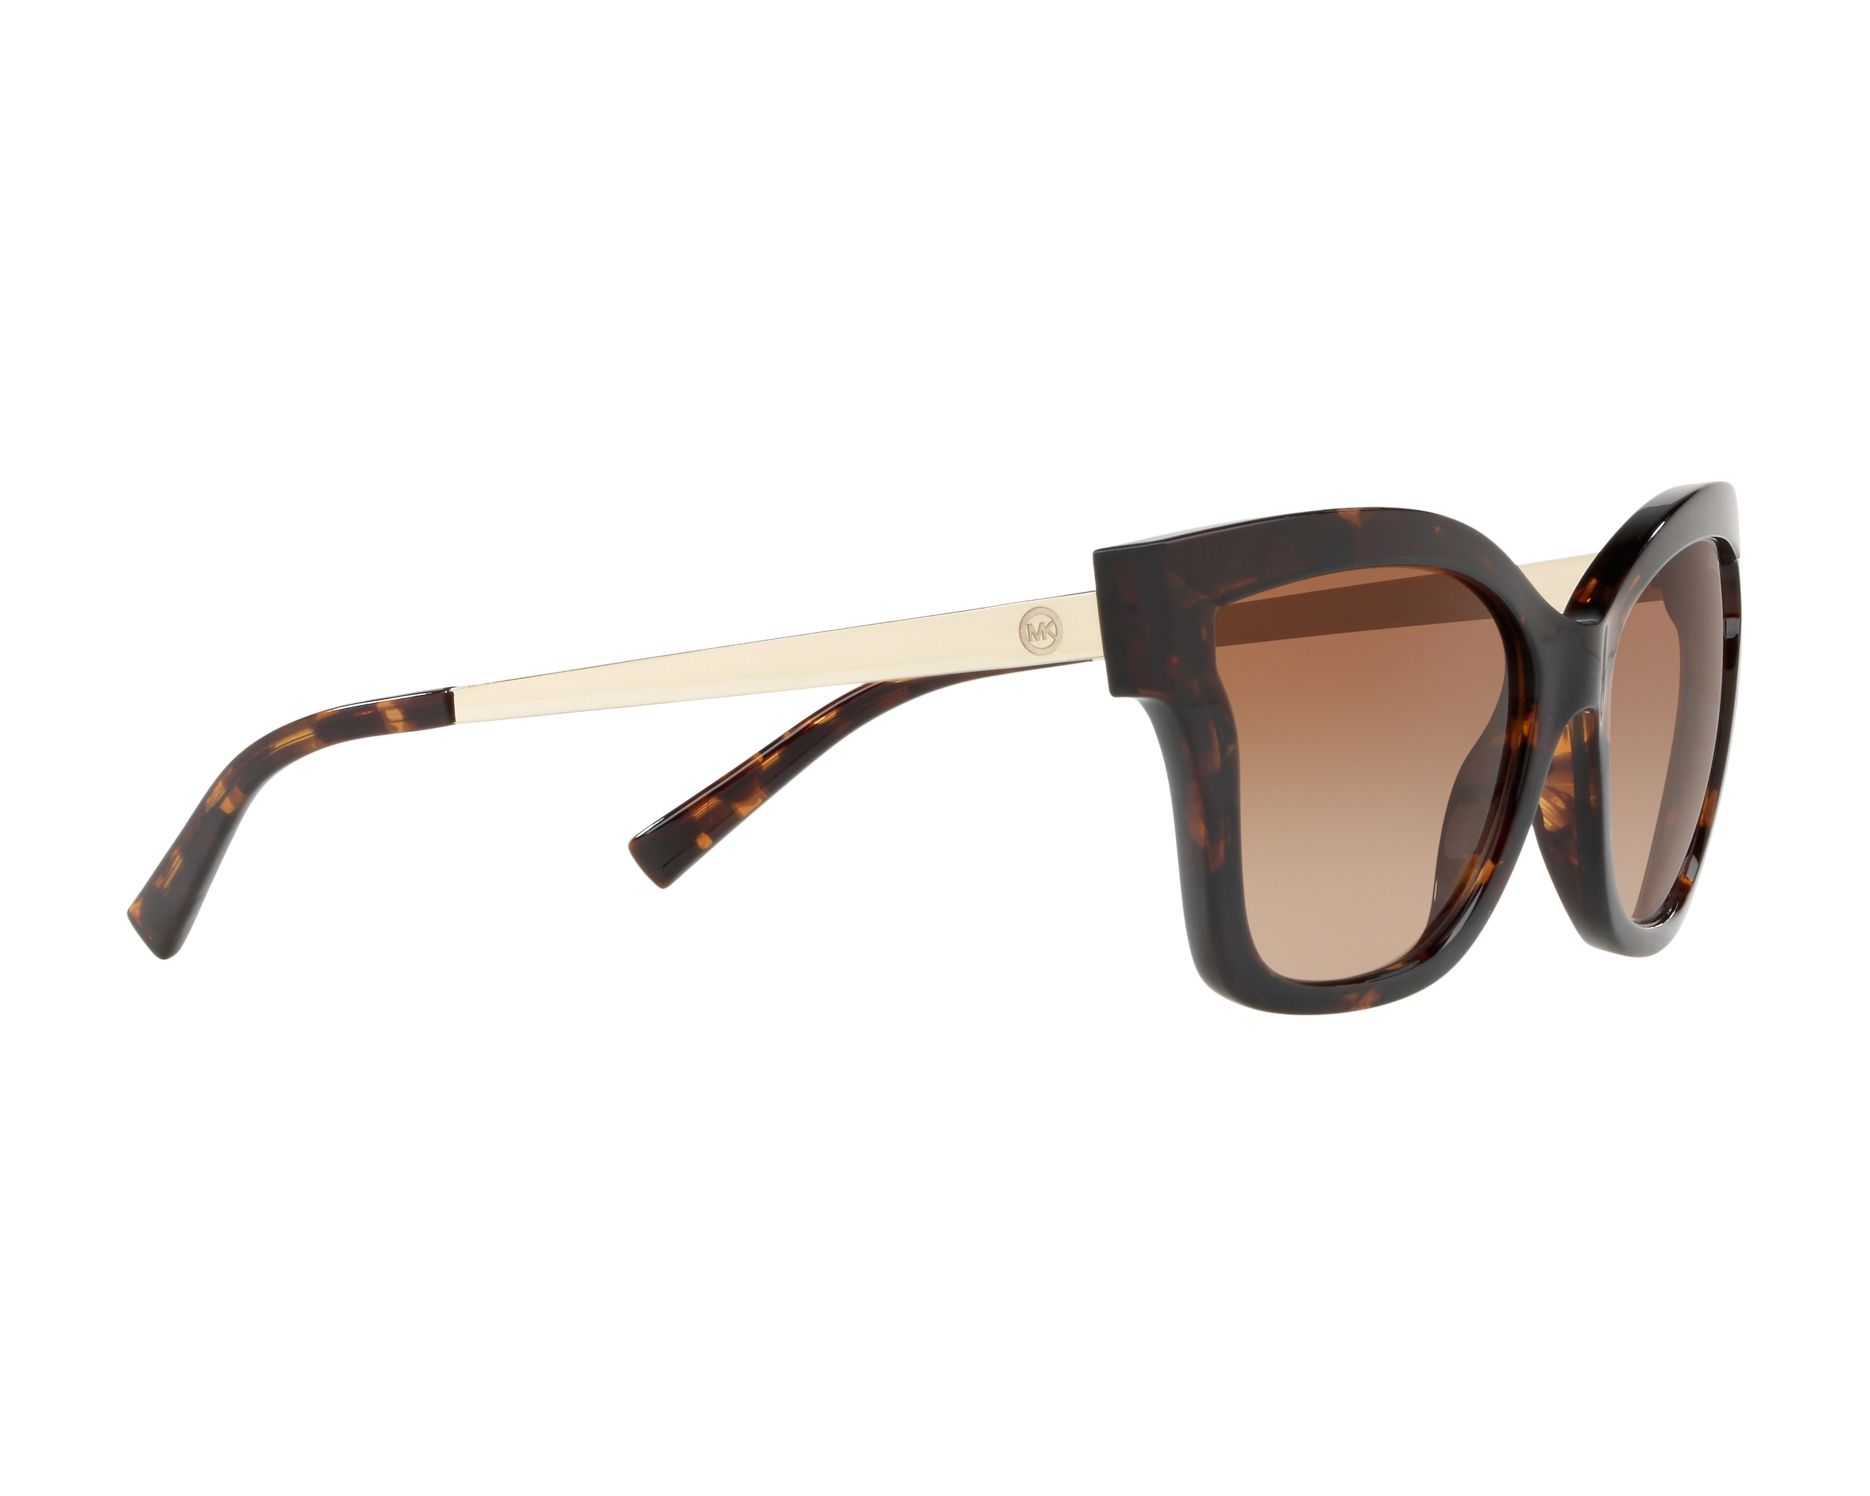 ddf6b6aed2 Sunglasses Michael Kors MK-2072 333313 56-17 Havana Gold 360 degree view 11